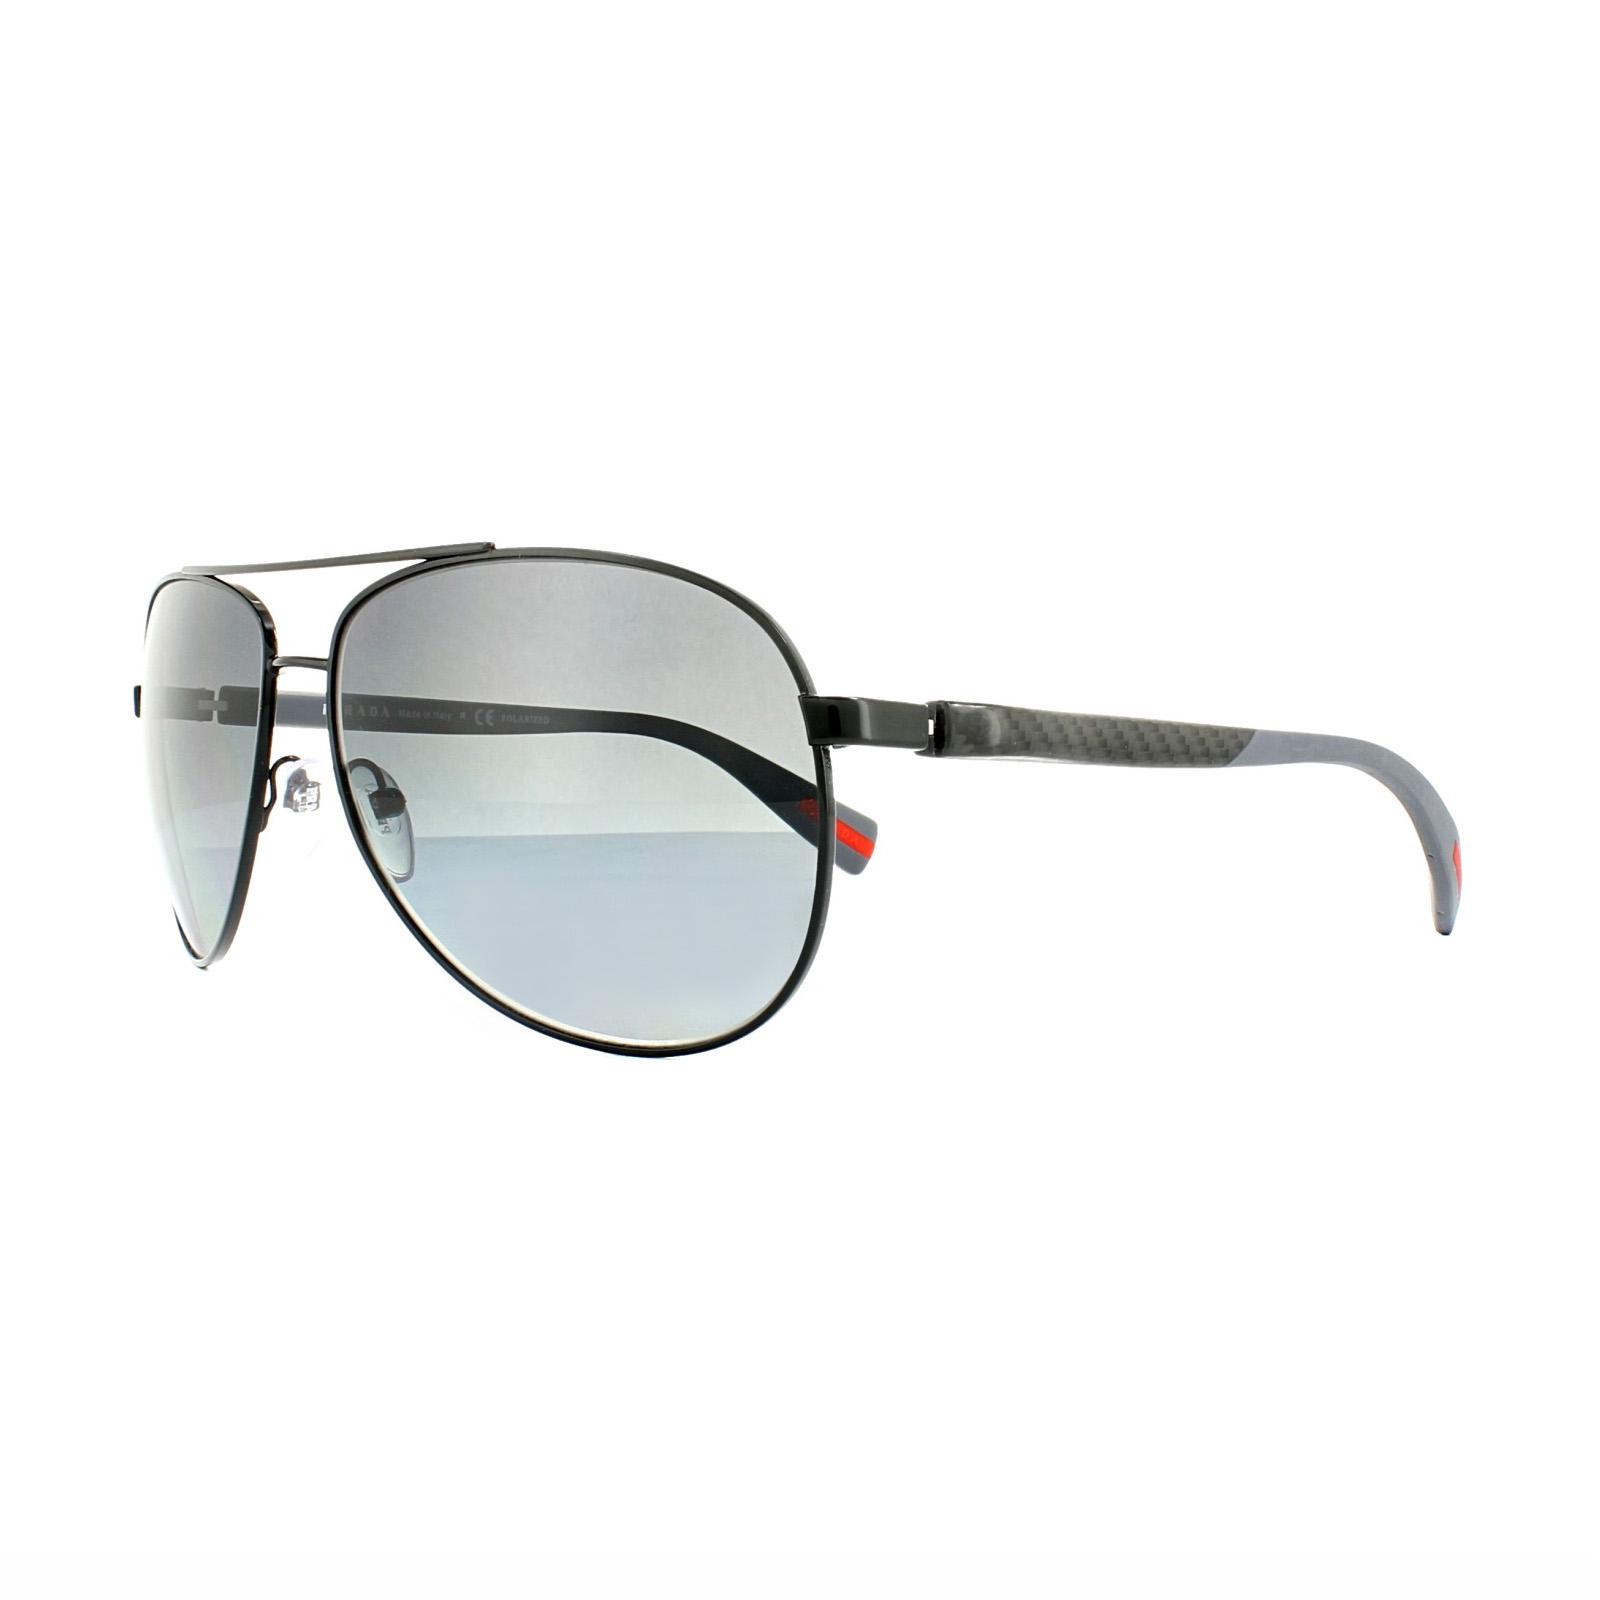 2ef1ce095f Sentinel Prada Sport Sunglasses 51OS 7AX5W1 Black Grey Gradient Polarized